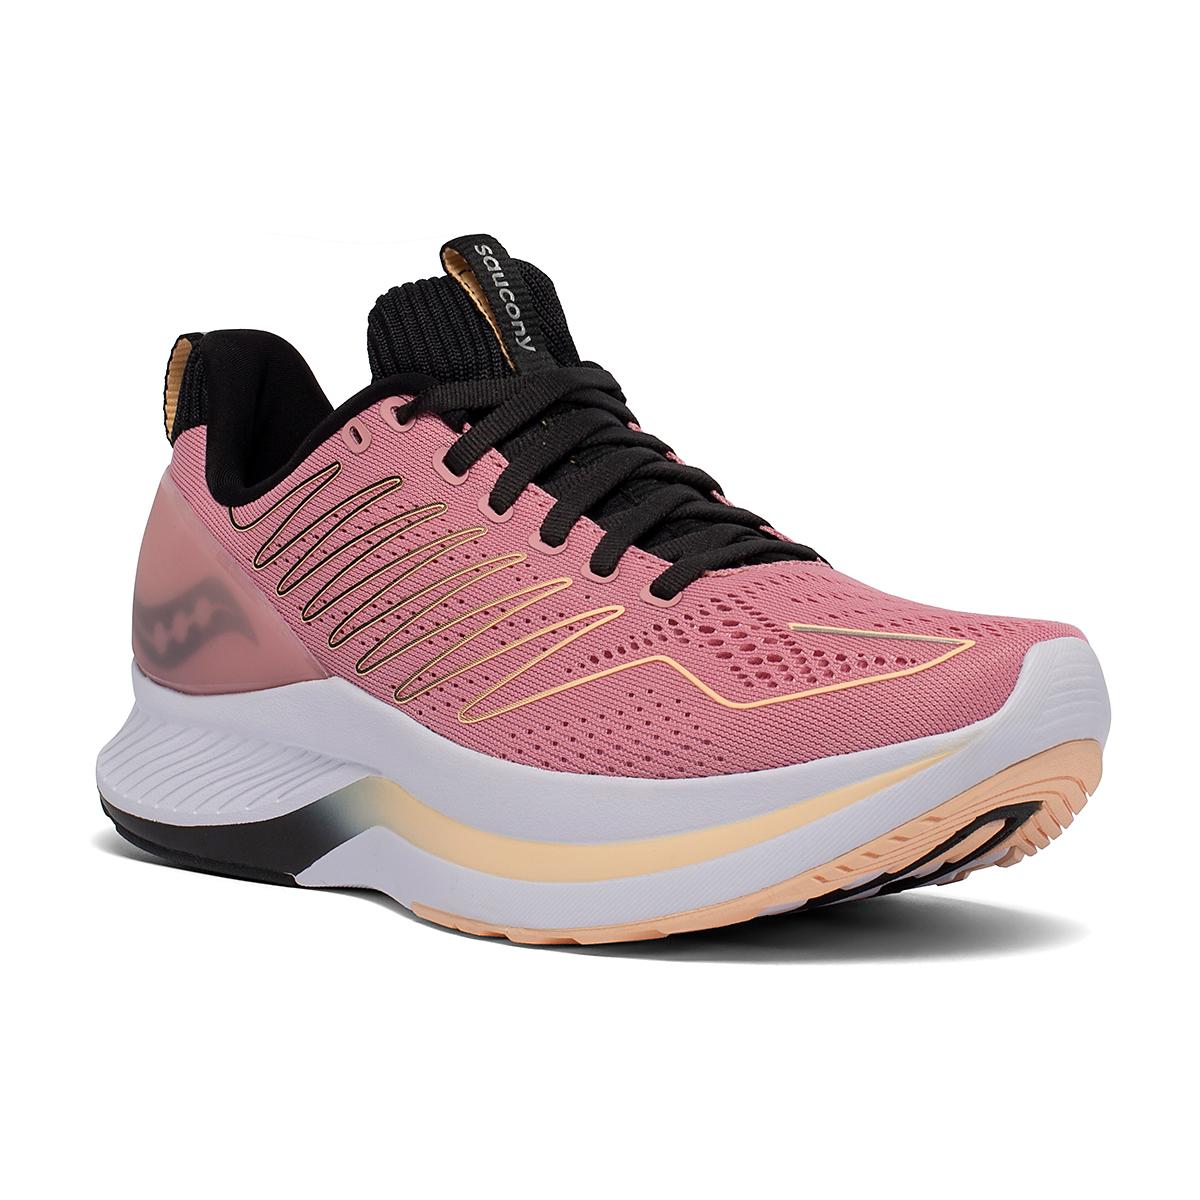 Women's Saucony Endorphin Shift Running Shoe - Color: Rosewater/Black - Size: 5 - Width: Regular, Rosewater/Black, large, image 2